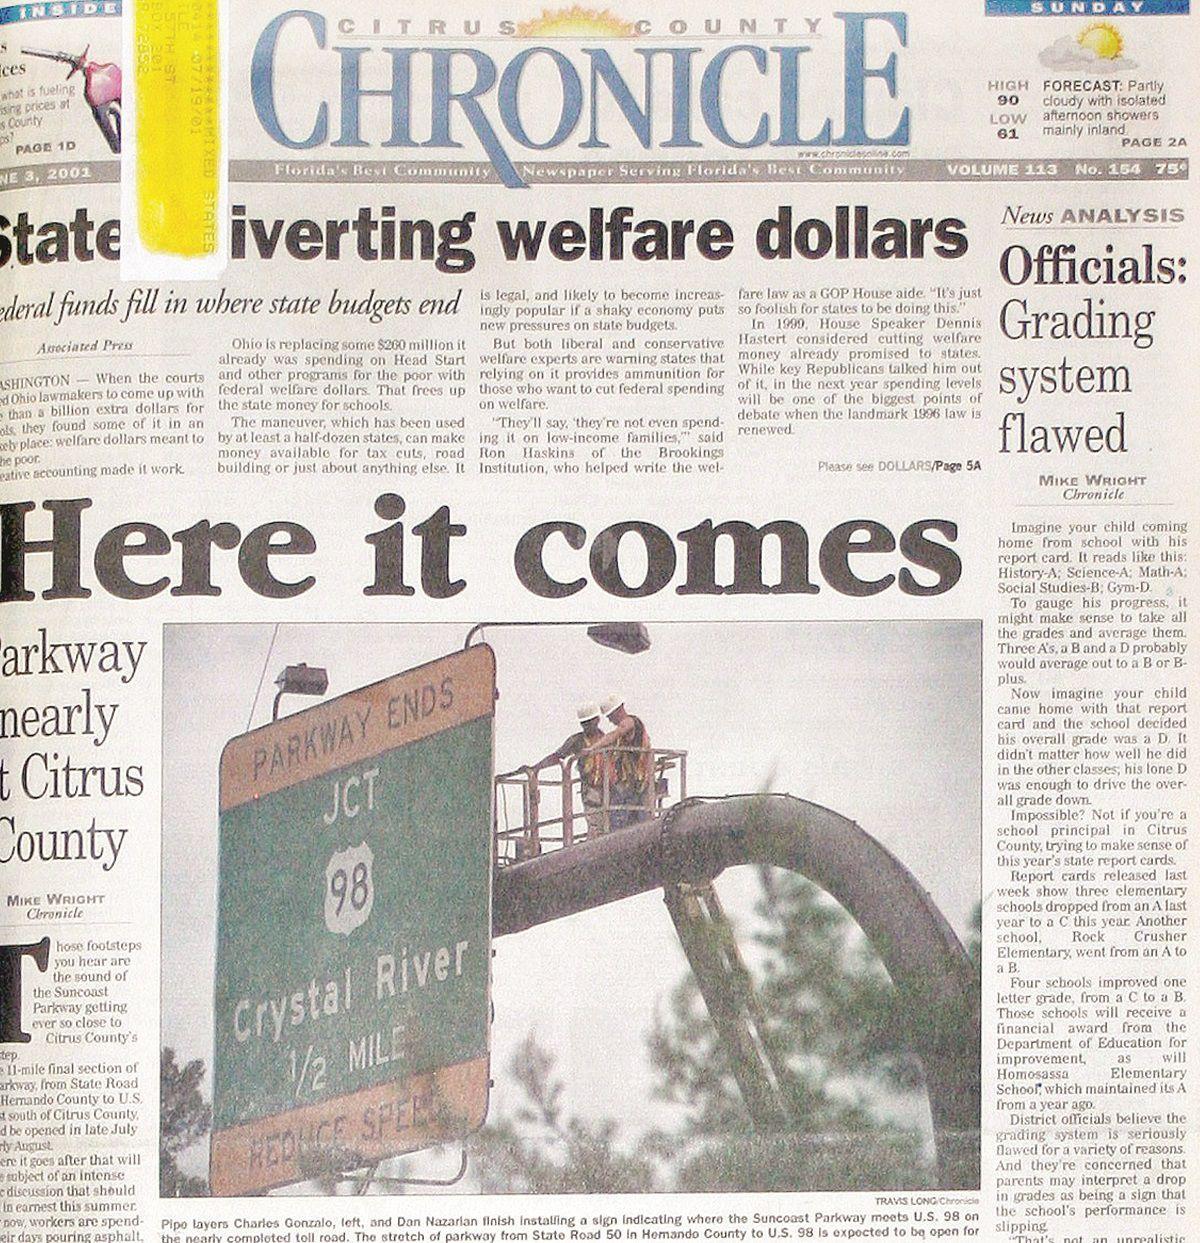 Citrus County Chronicle June 3, 2001